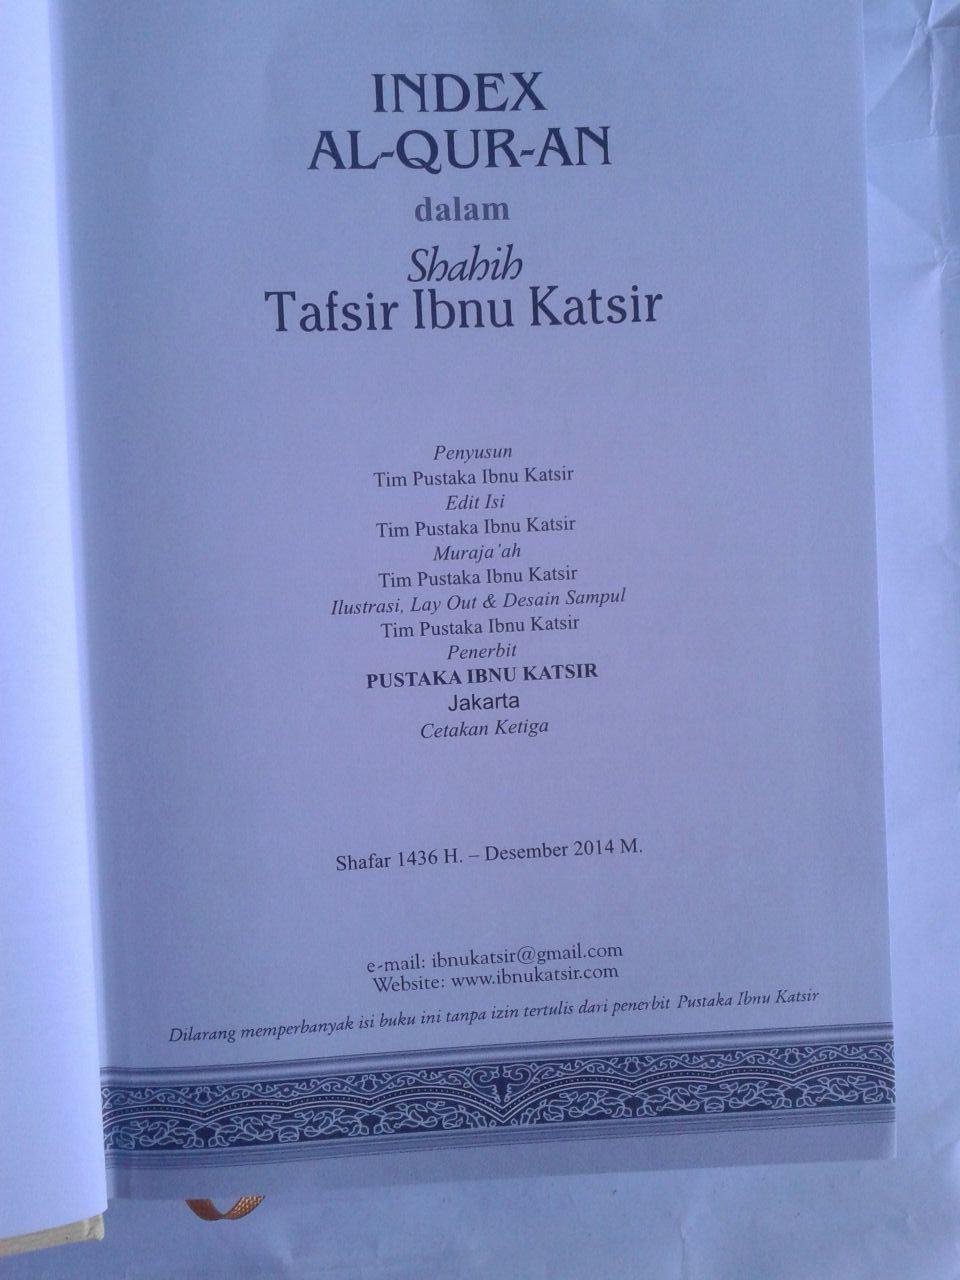 Buku Index Al-Qur'an Dalam Shahih Tafsir Ibnu Katsir isi 2